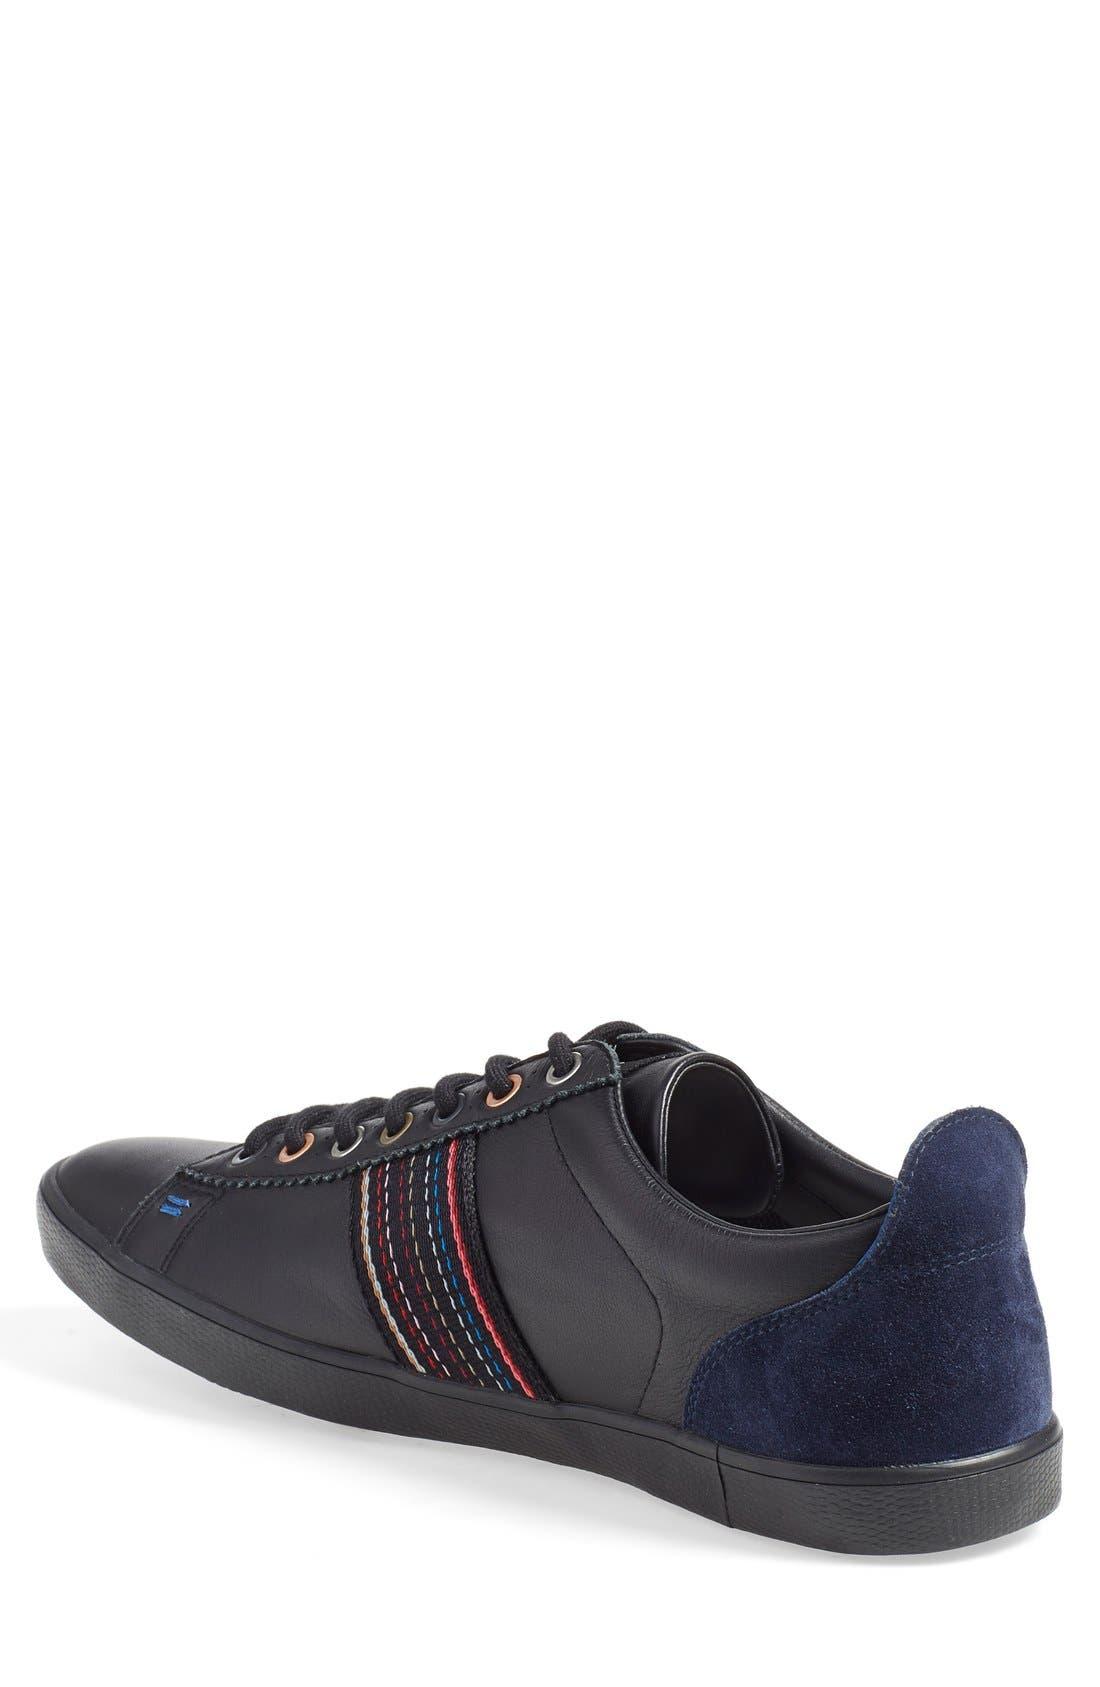 Alternate Image 2  - Paul Smith 'Osmo' Sneaker (Men)